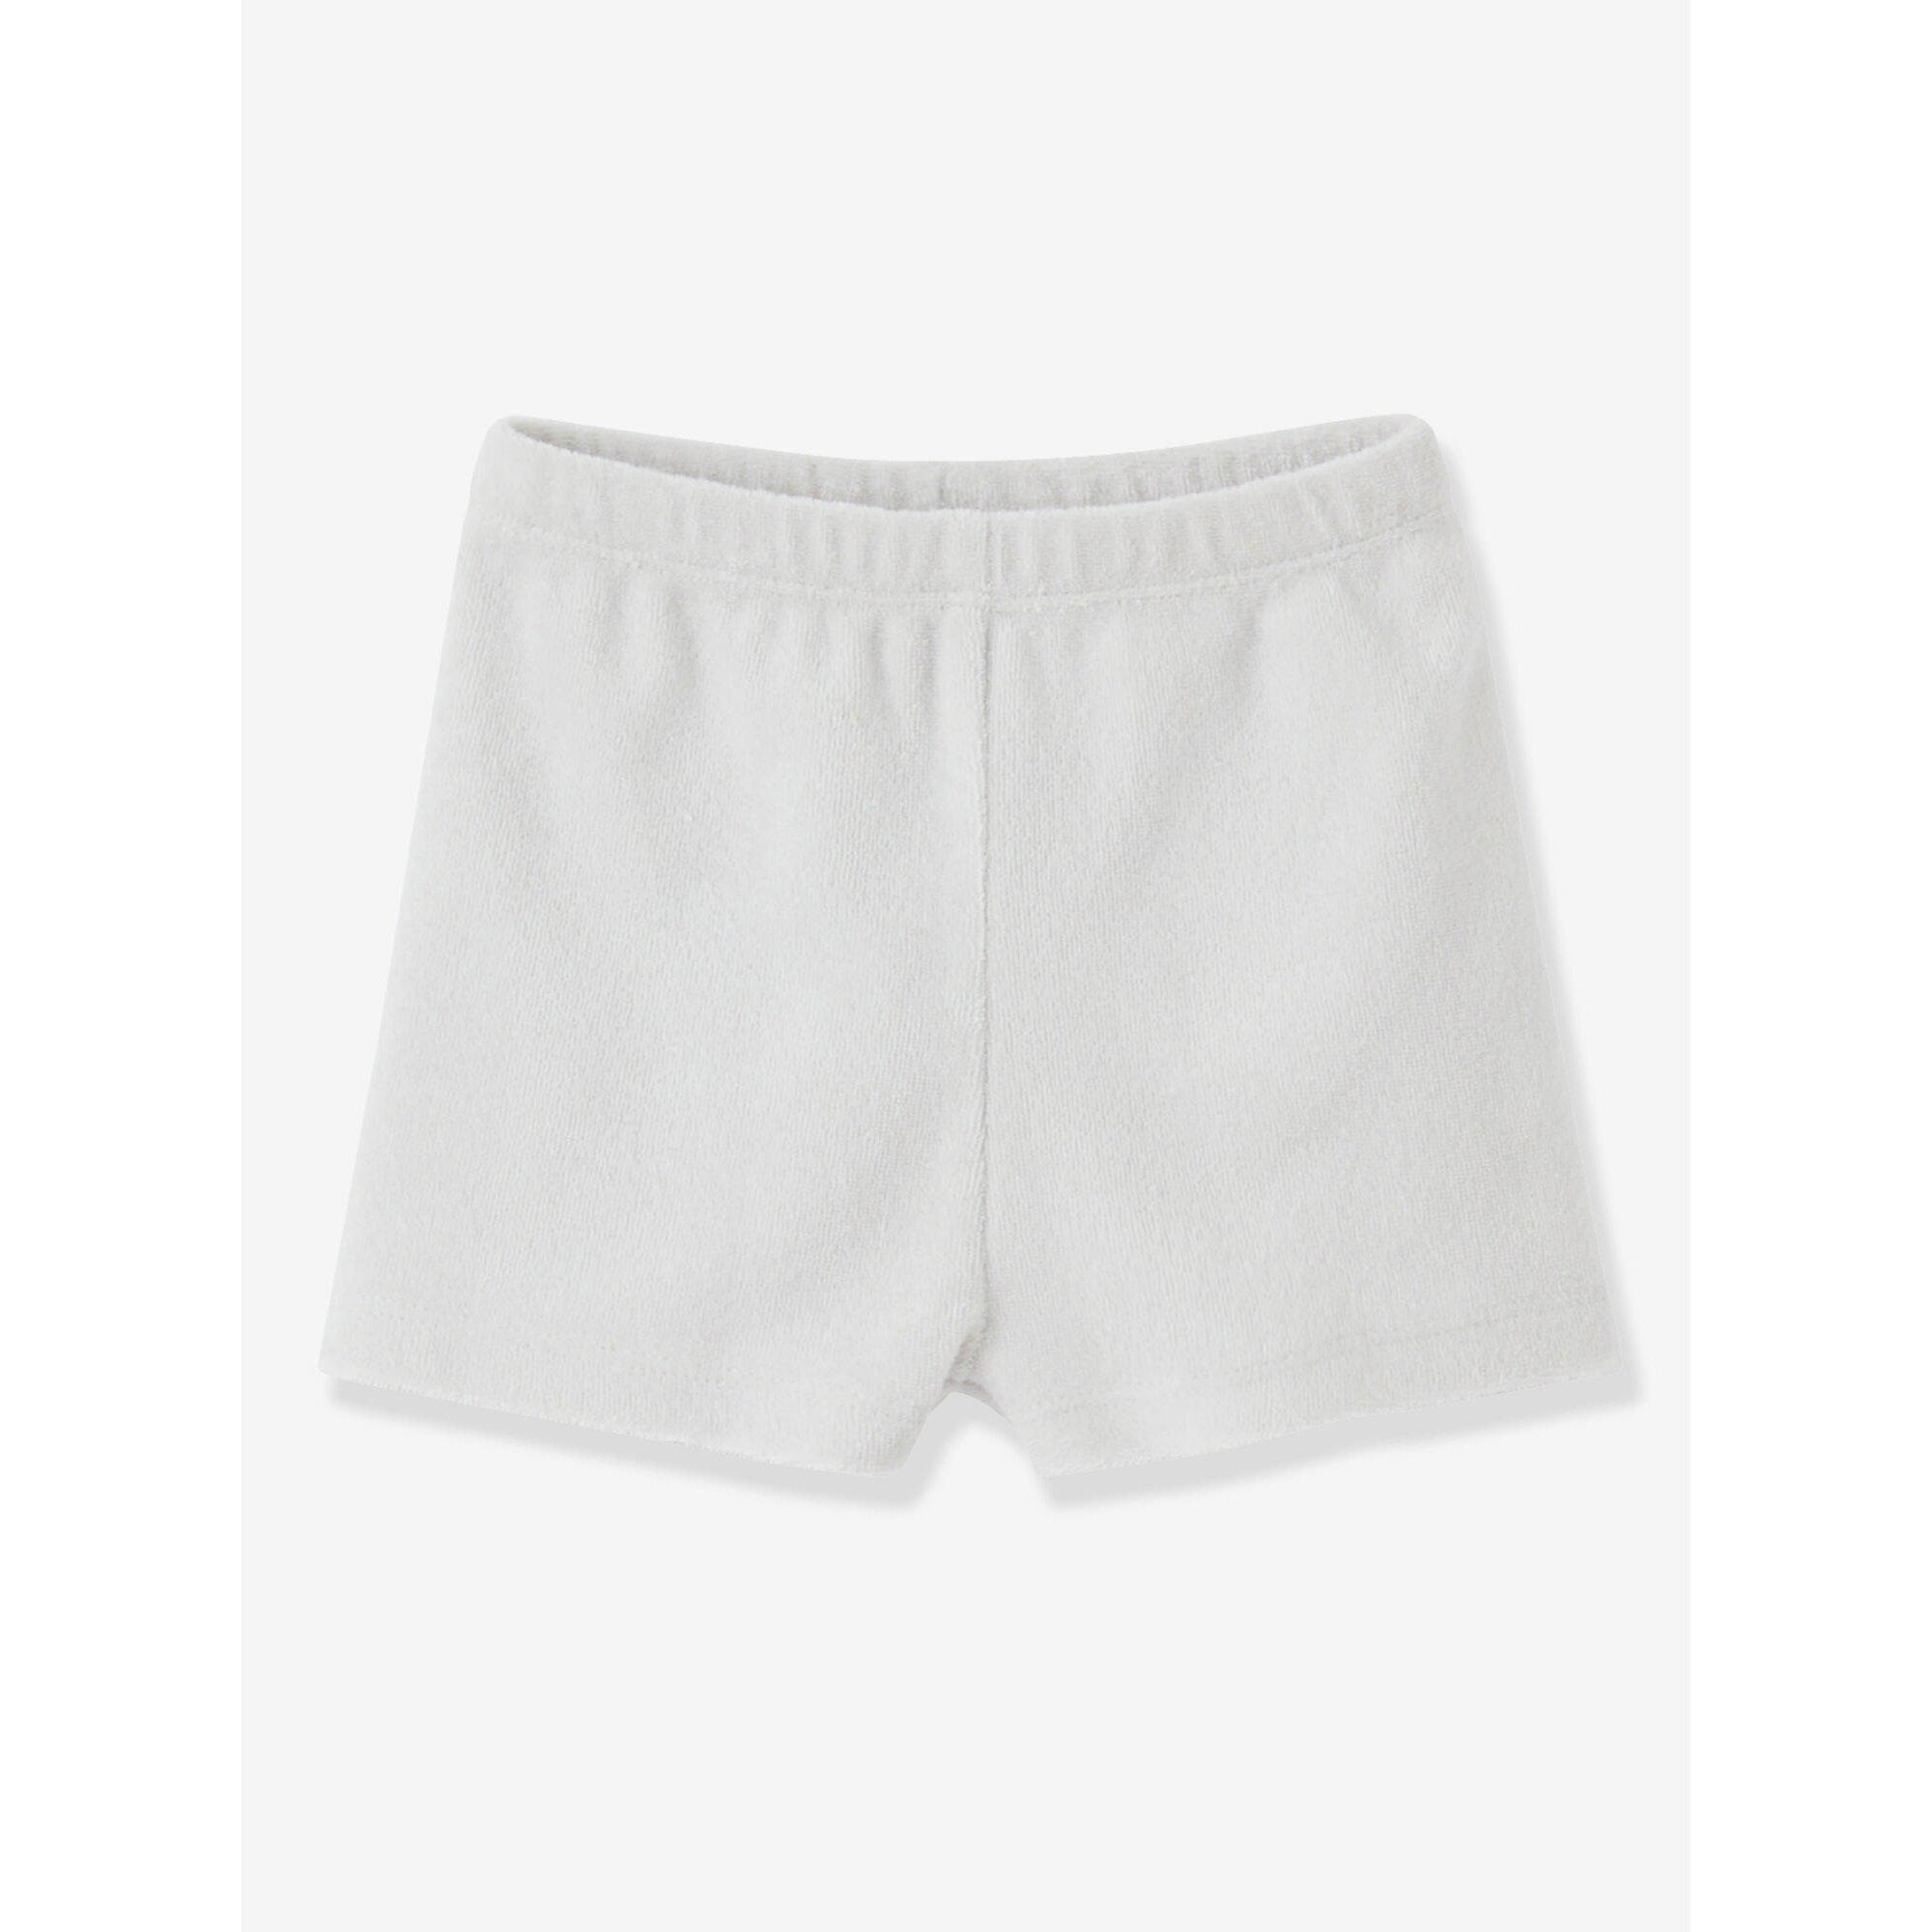 vertbaudet-4er-pack-frottee-shorts-baby-jungen, 13.99 EUR @ babywalz-de